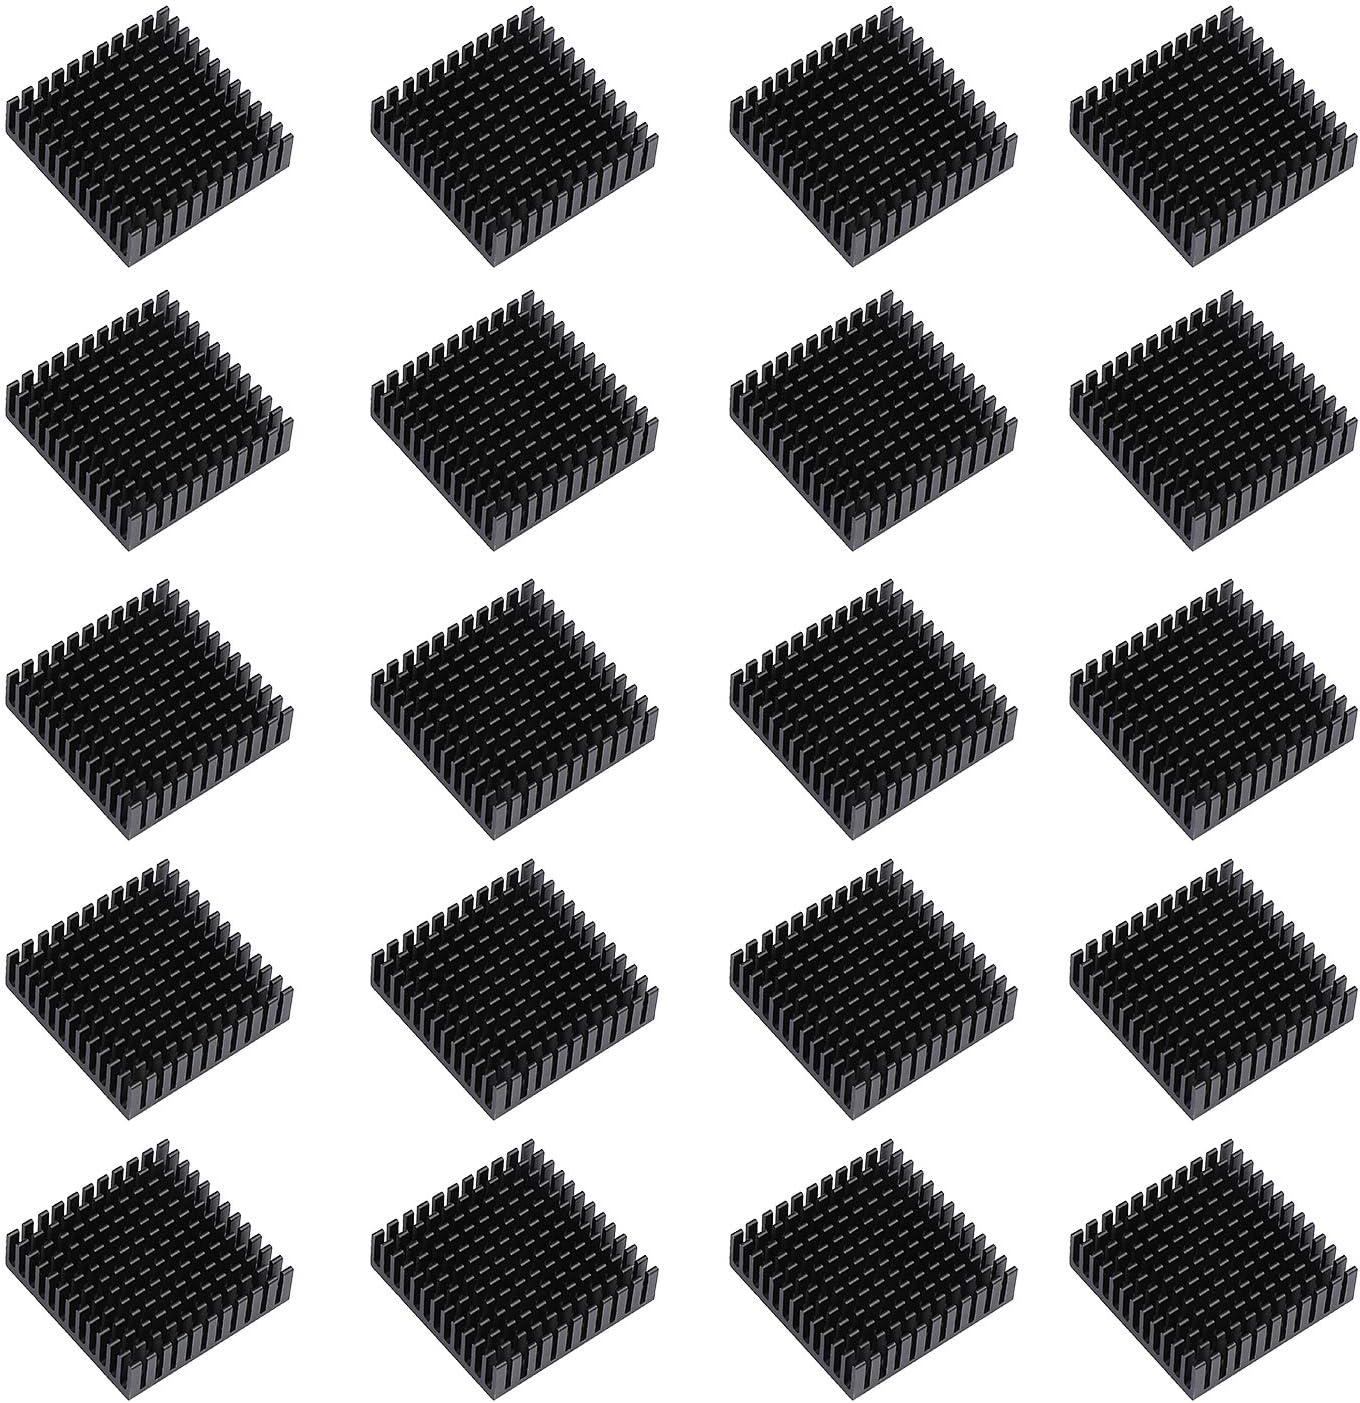 ESUMIC 20PCS 40mm x 40mm x 11mm Black Aluminum Heatsink Cooling Fin for Cooling MOSFET VRam Regulators VRM Stepper Driver